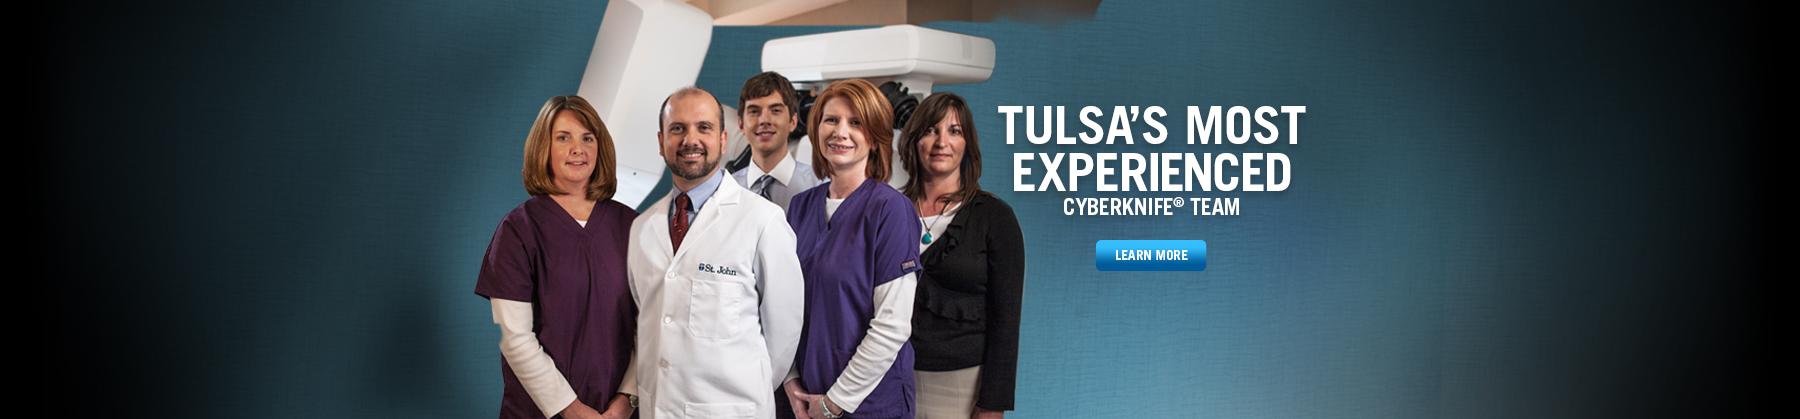 Tulsa's Most Experienced Cyberknife Team